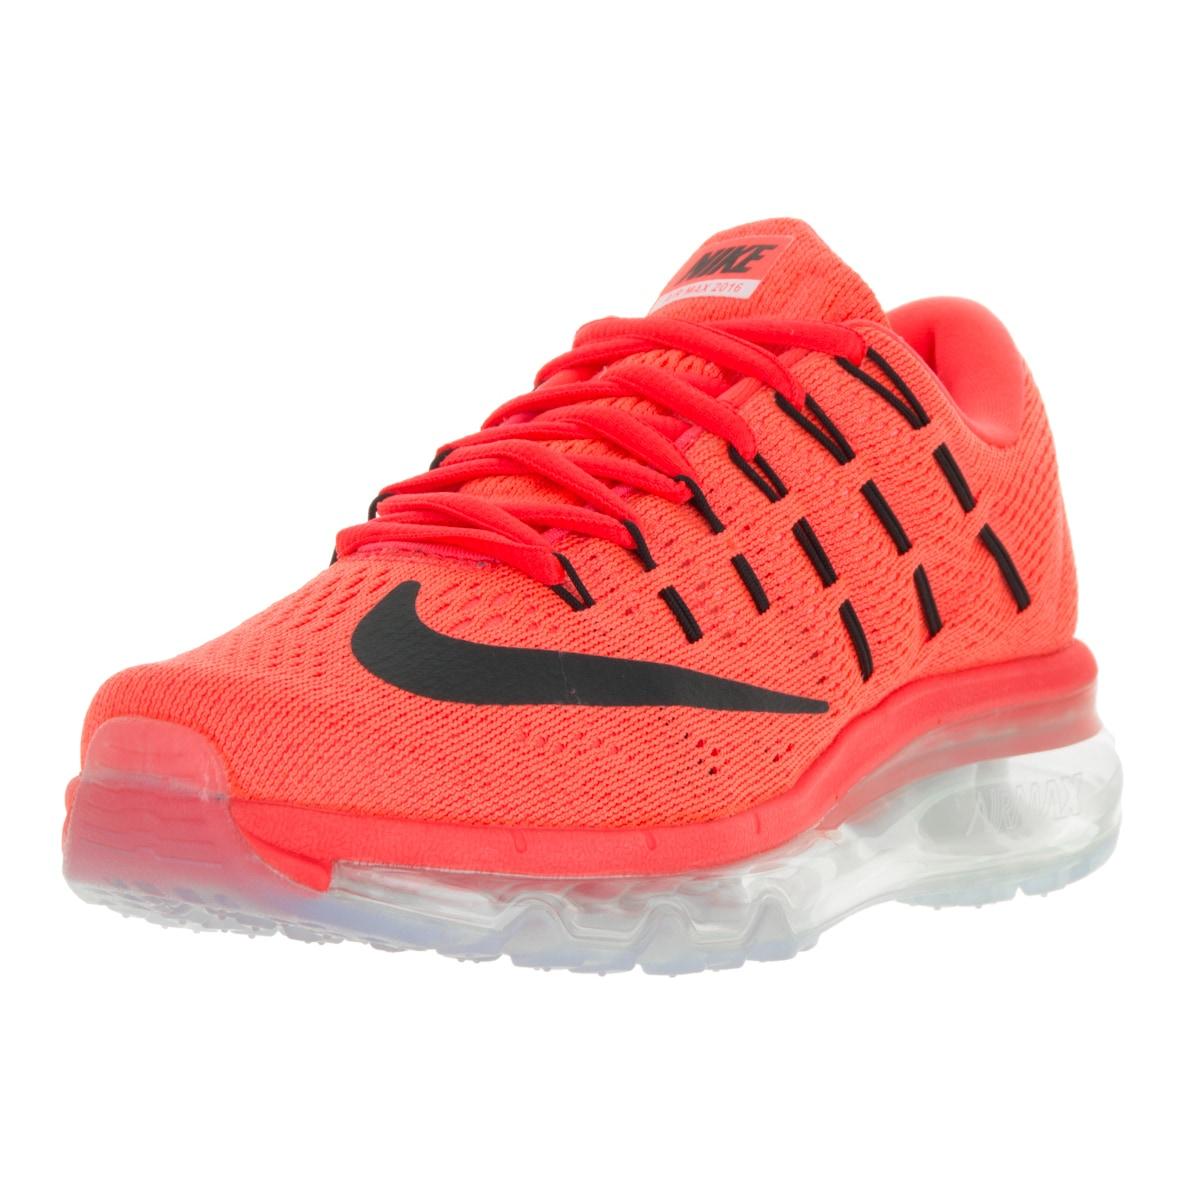 Nike Women's Air Max 2016 Bright Crimson/Black University...